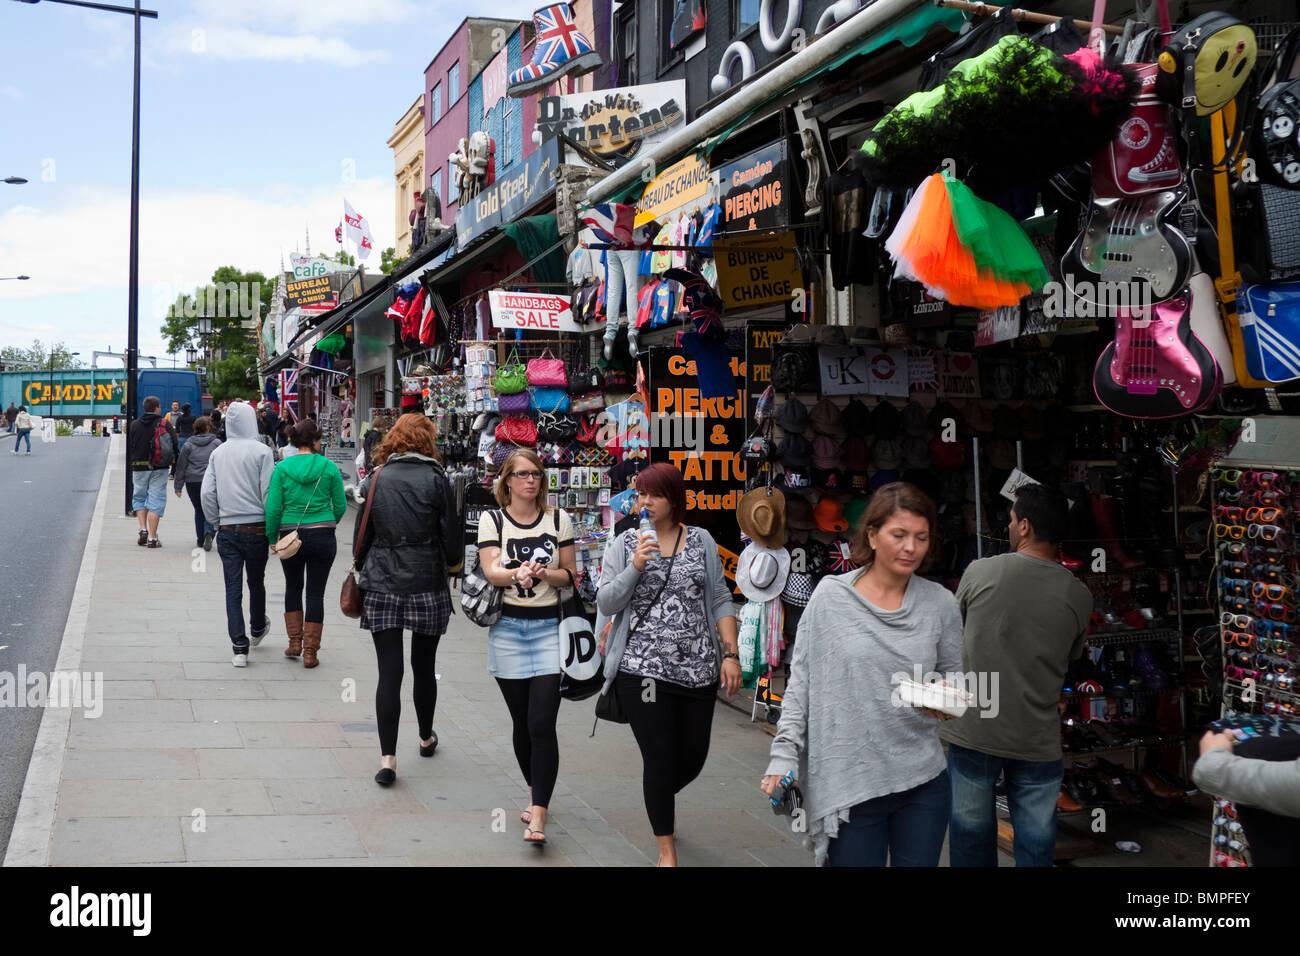 People walking along Camden High Street, London, England, UK - Stock Image